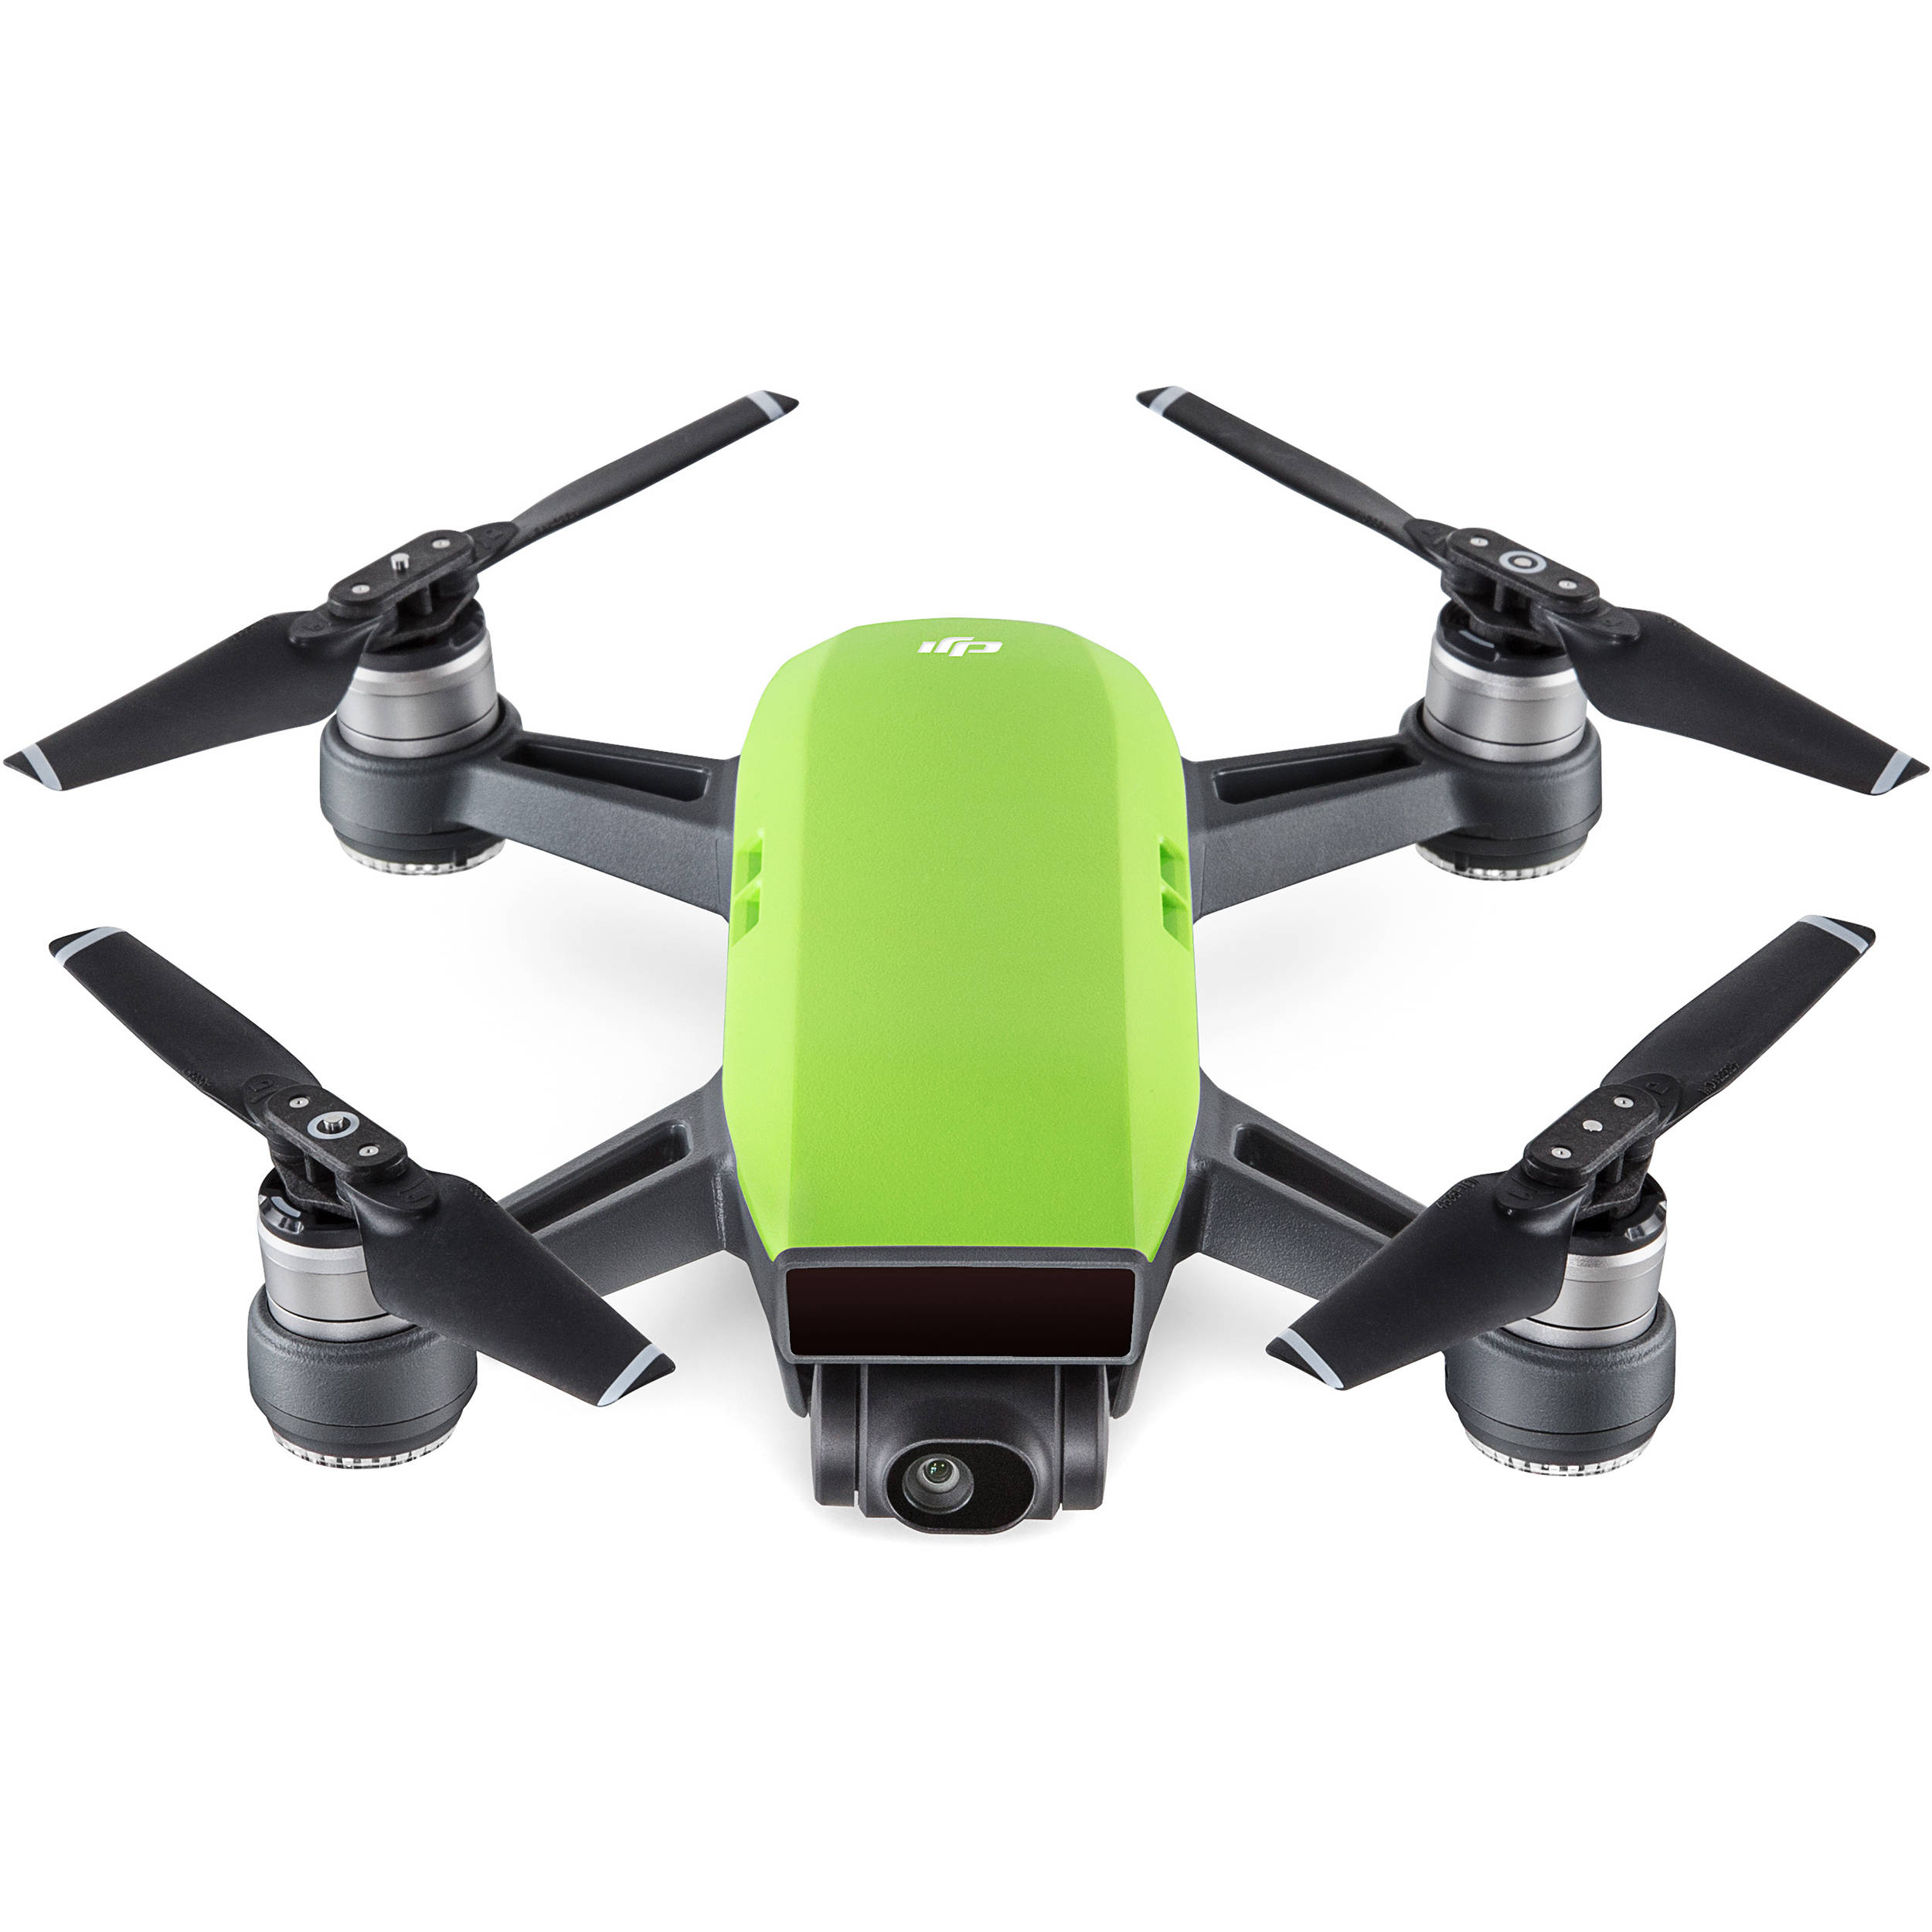 Dji Spark Drone >> Dji Spark Drone Quadcopter Meadow Green B H